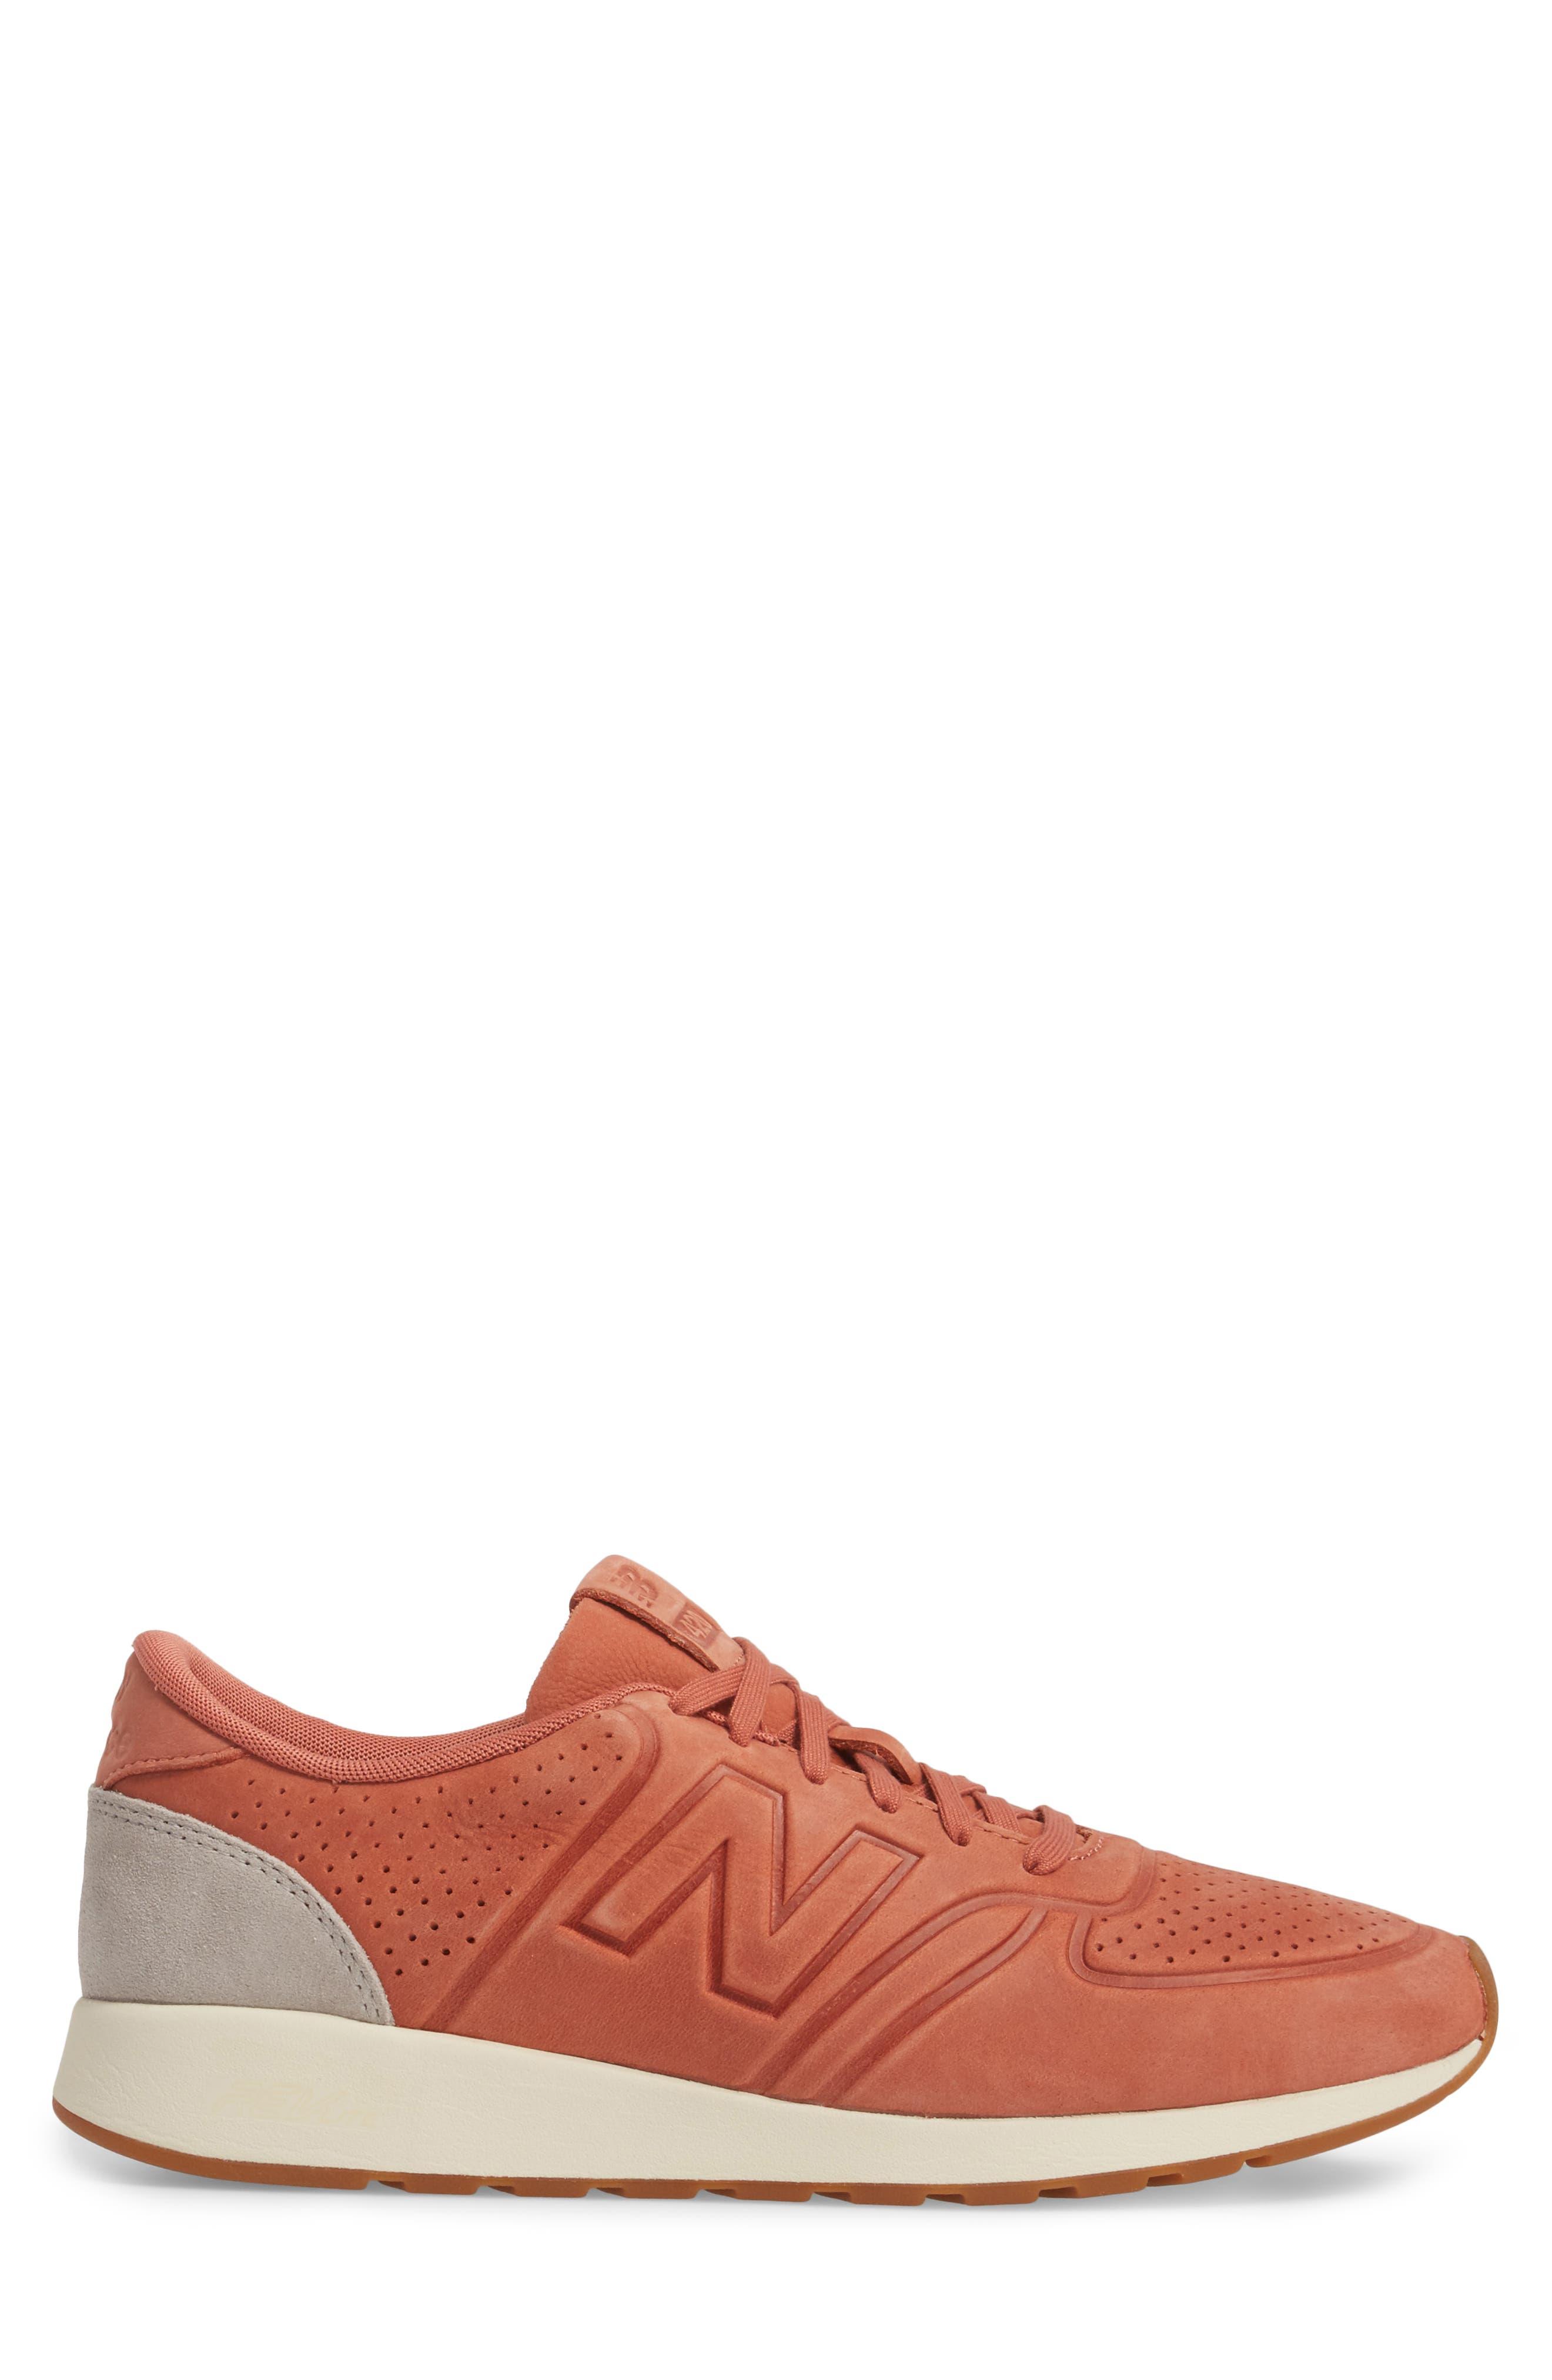 Alternate Image 3  - New Balance 420 Premium Decon Sneaker (Men)